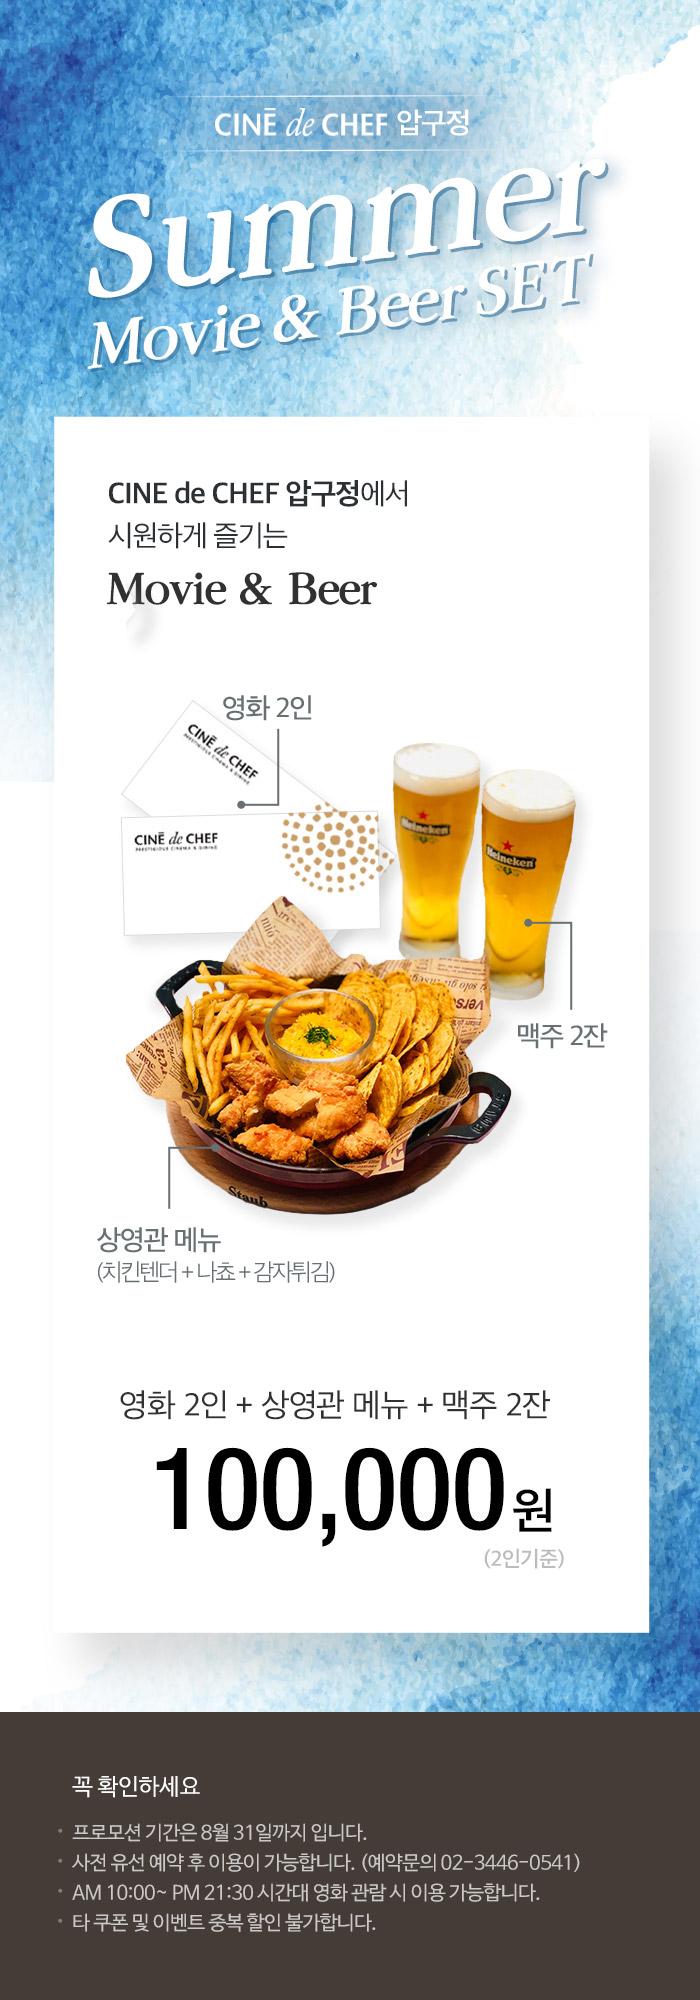 CGV극장별 [씨네드쉐프 압구정] Summer Movie & Beer SET